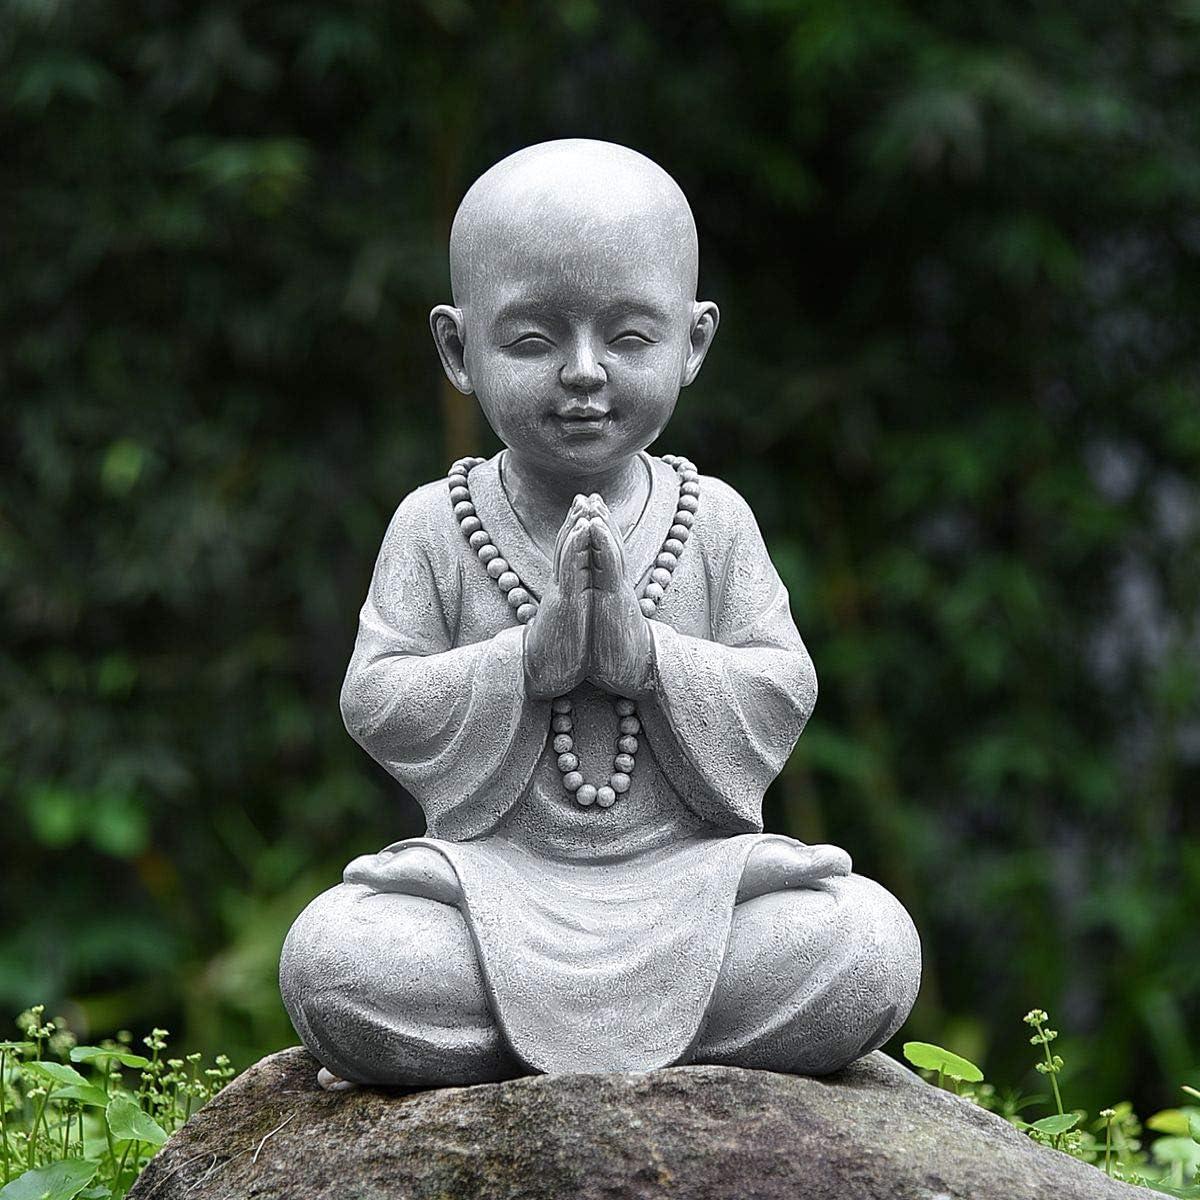 Amazon Com Meditating Baby Monk Buddha Statue Figurine Zen Garden Monk Sculpture Decor For Home Garden Patio Deck Porch Yard Art Decoration With Natural Wood Beaded Necklace 11 2 Inch Grey Kitchen Dining